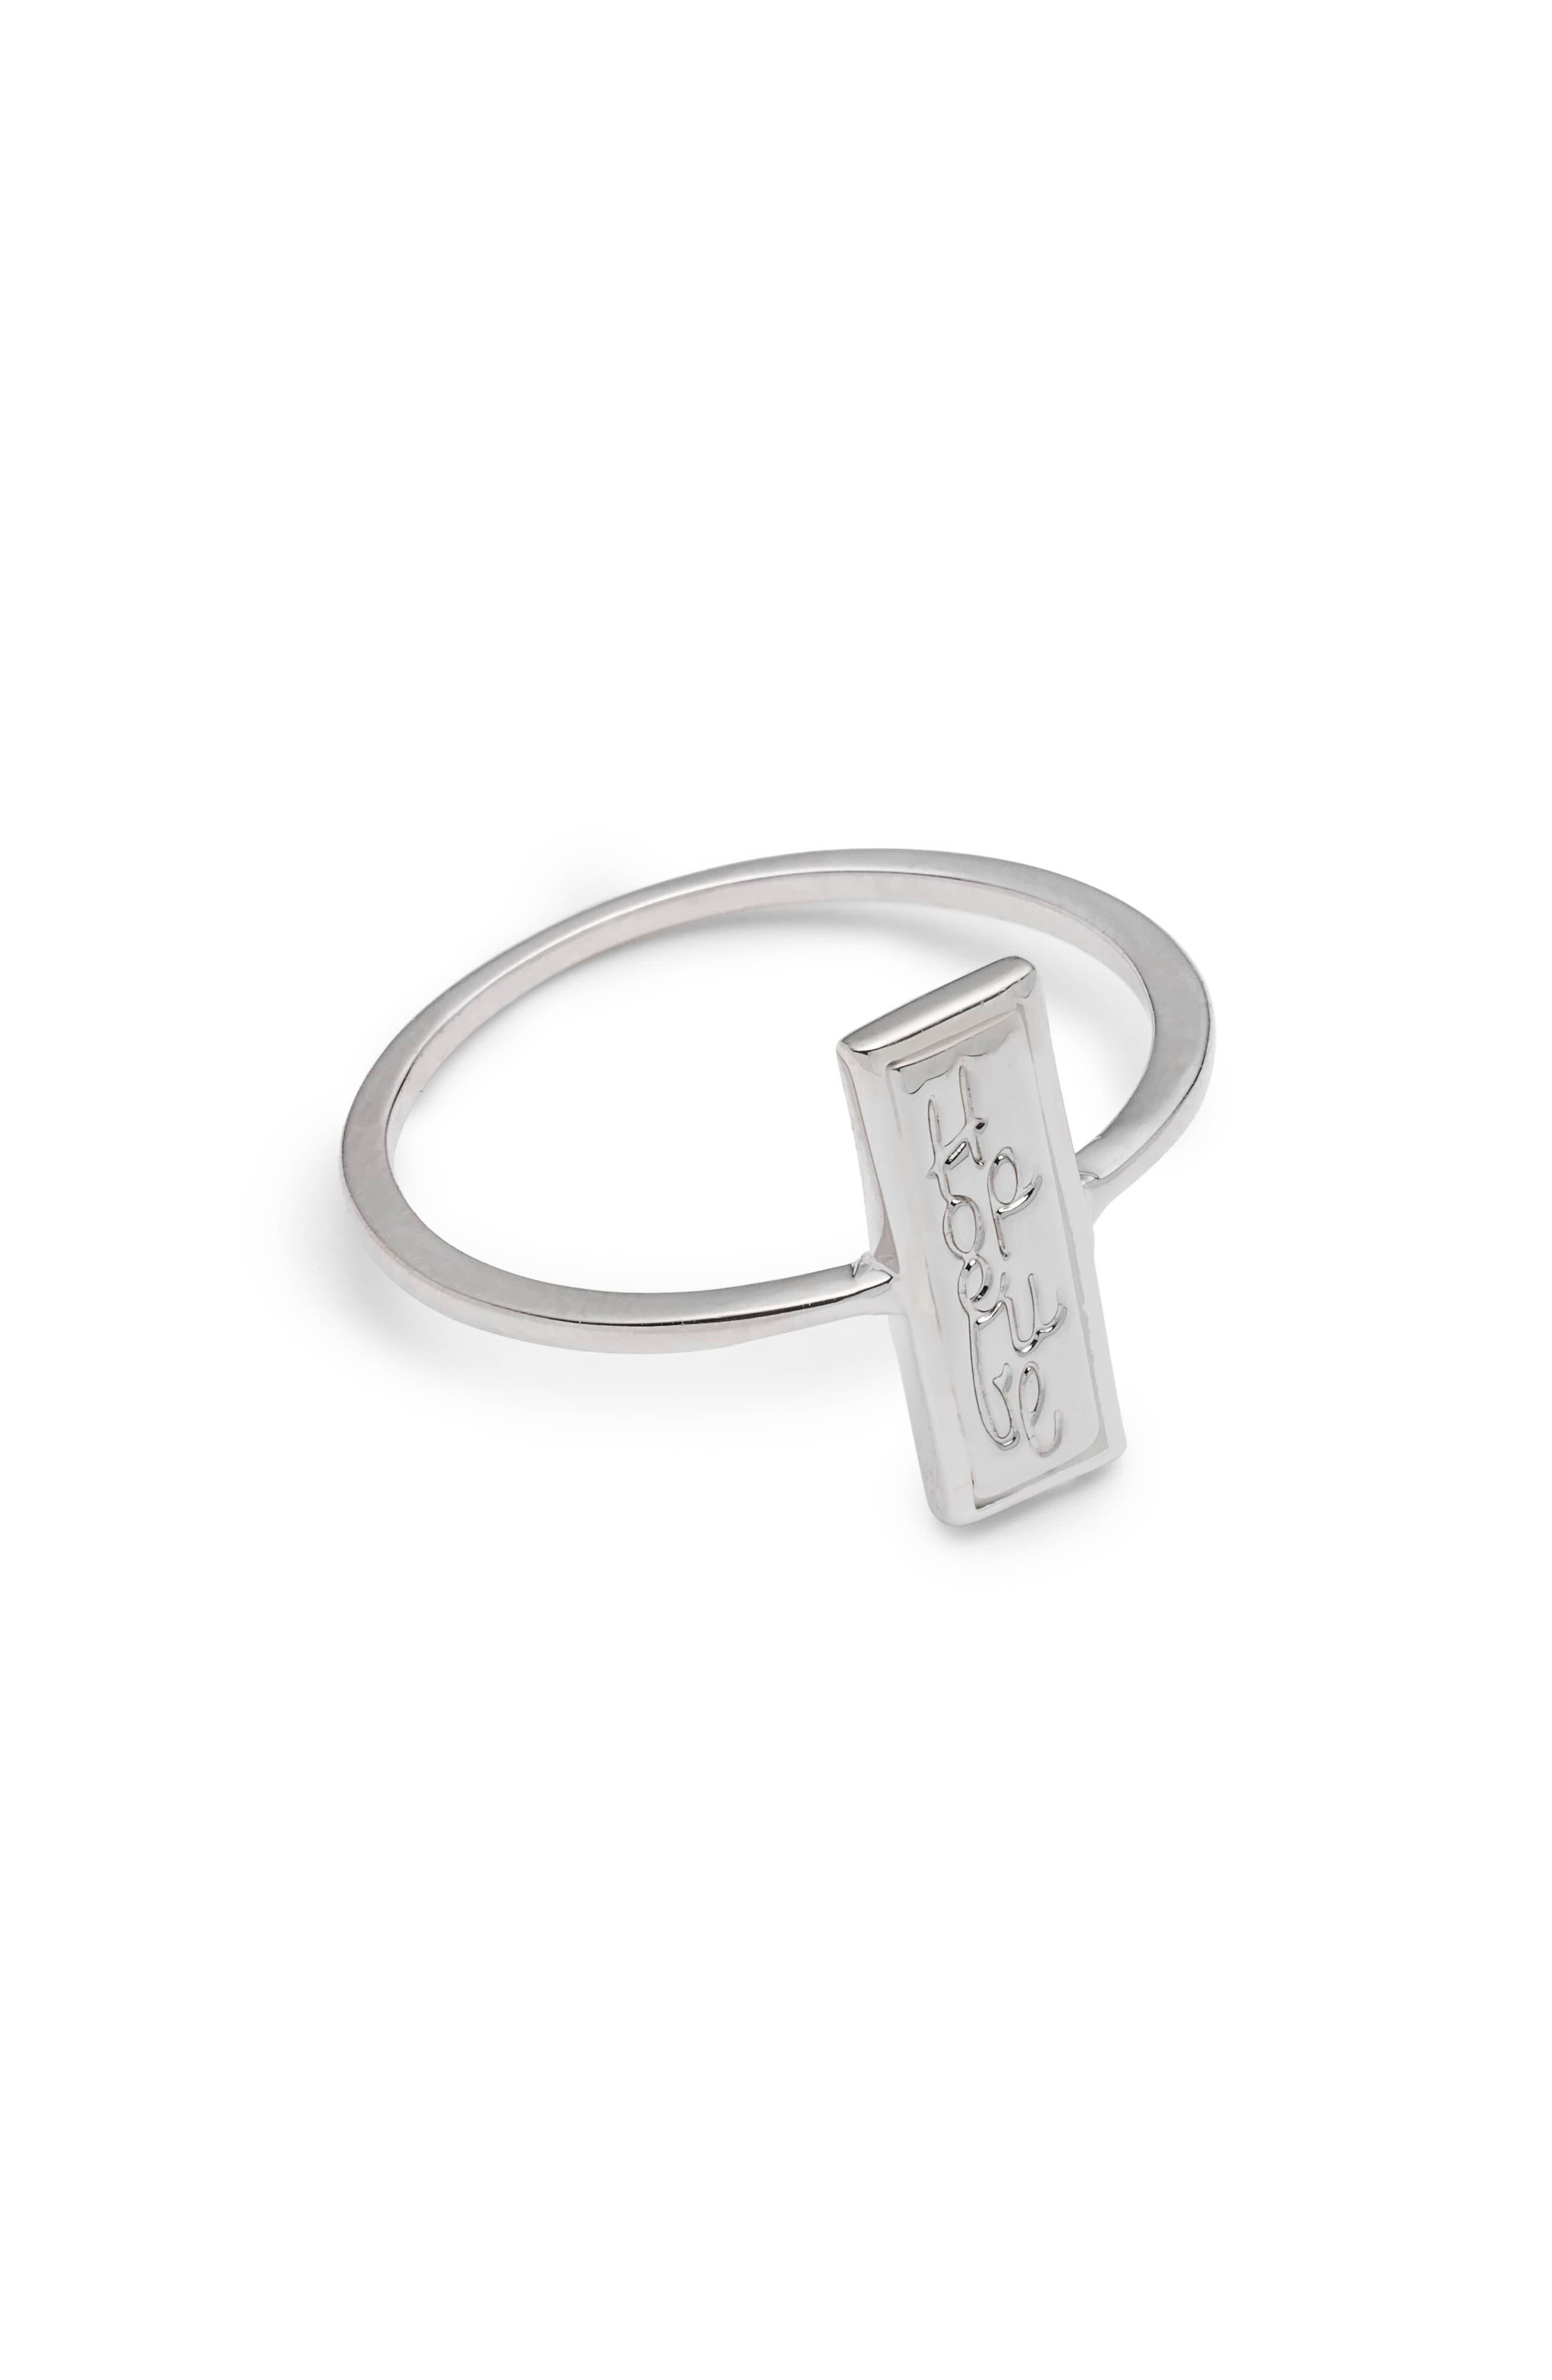 Hopeful Ring,                         Main,                         color, Silver